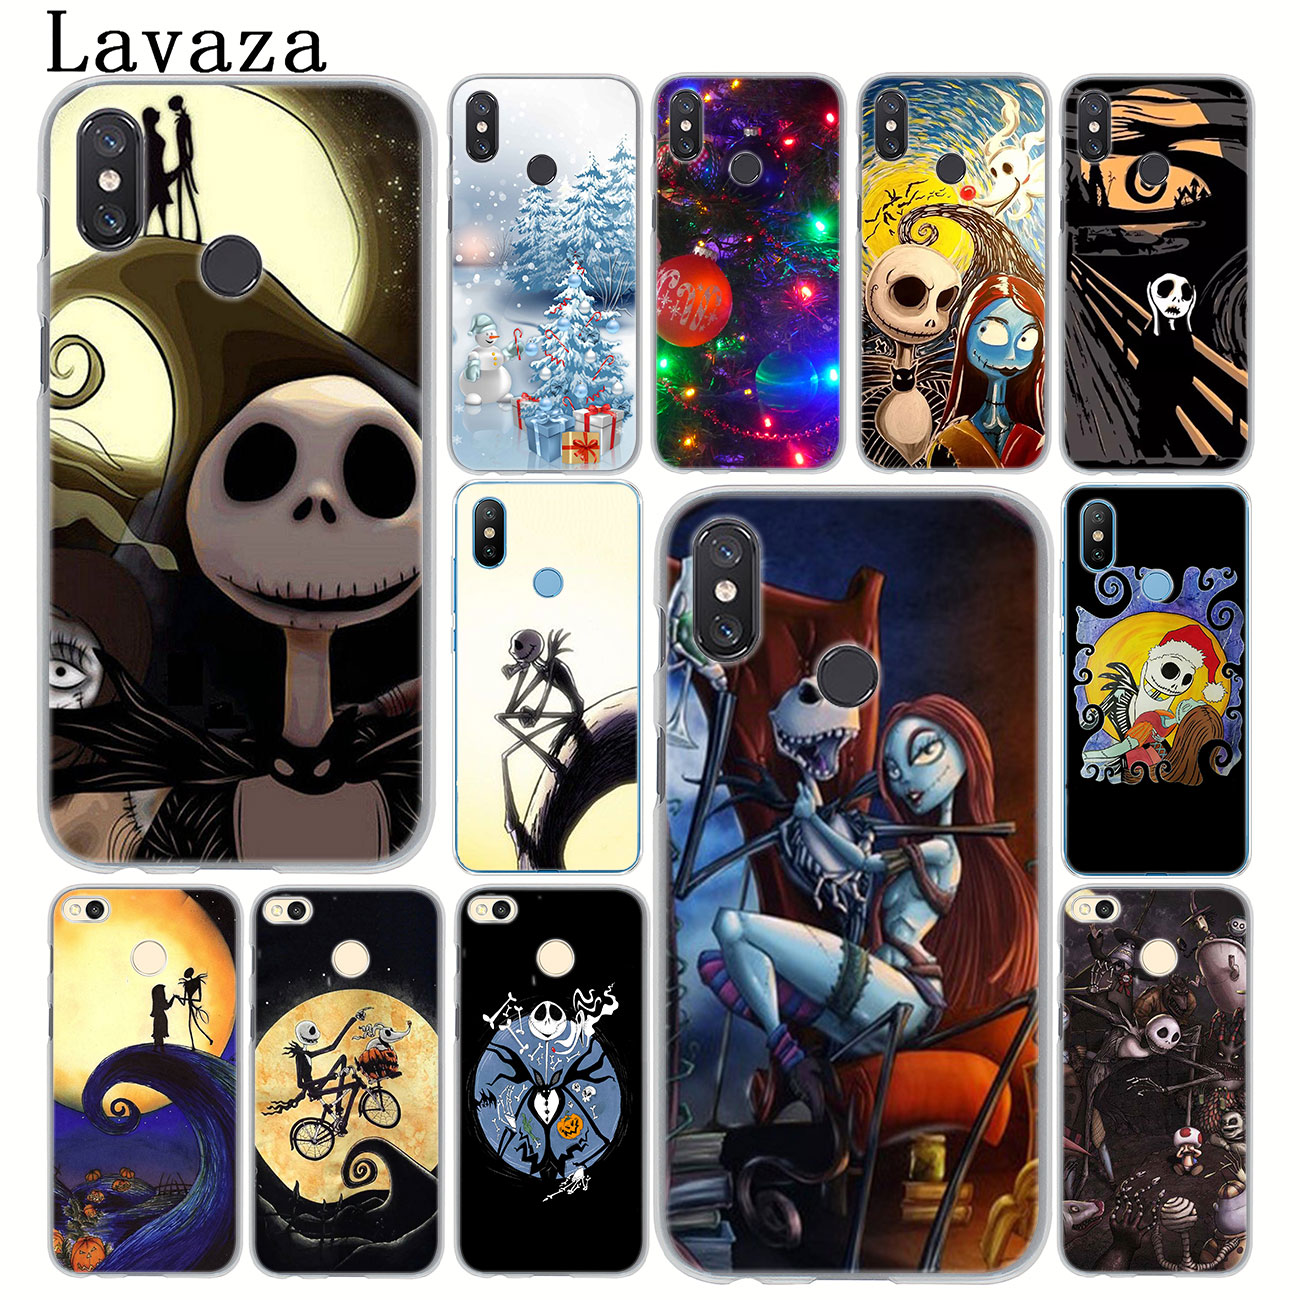 Jack funda de teléfono para Xiaomi de jack de pesadilla para Halloween, MI 10, 9, 9T, CC9, CC9E, A3 Pro, 8, SE, A2 Lite, A1, pocophone f1, 6, Mi10